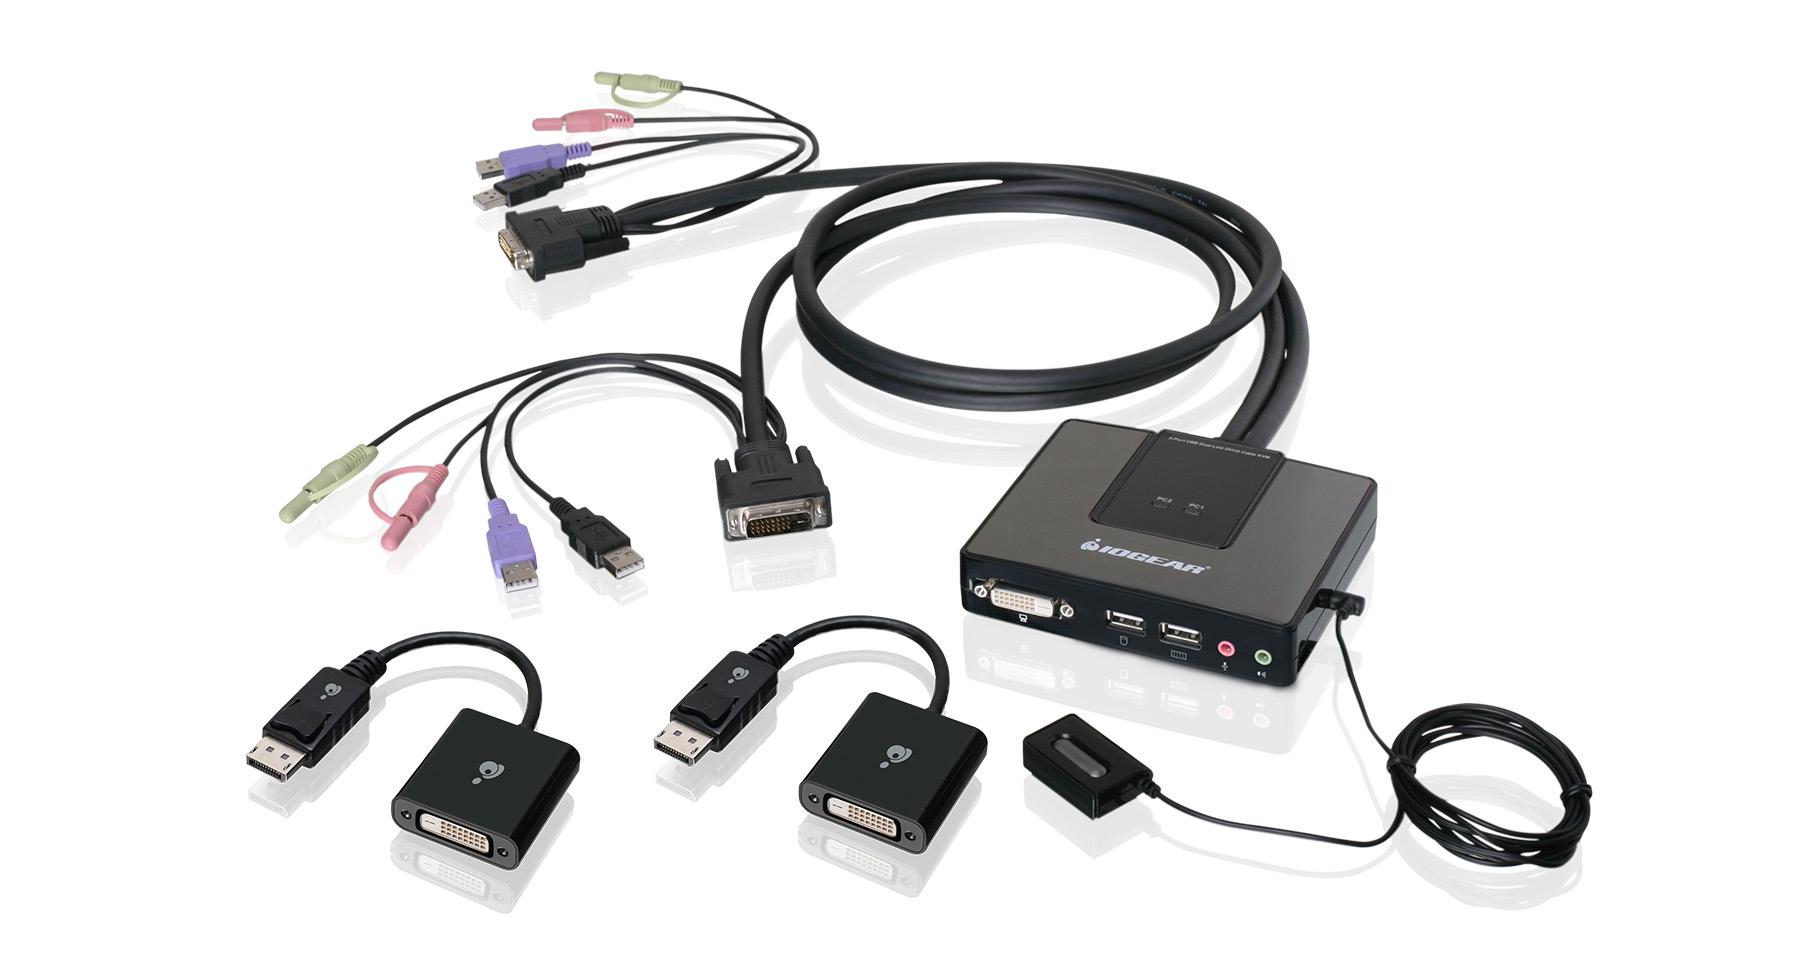 IOGEAR GCSDPKIT Port DualLink DVI And DisplayPort Cable - Port dvi